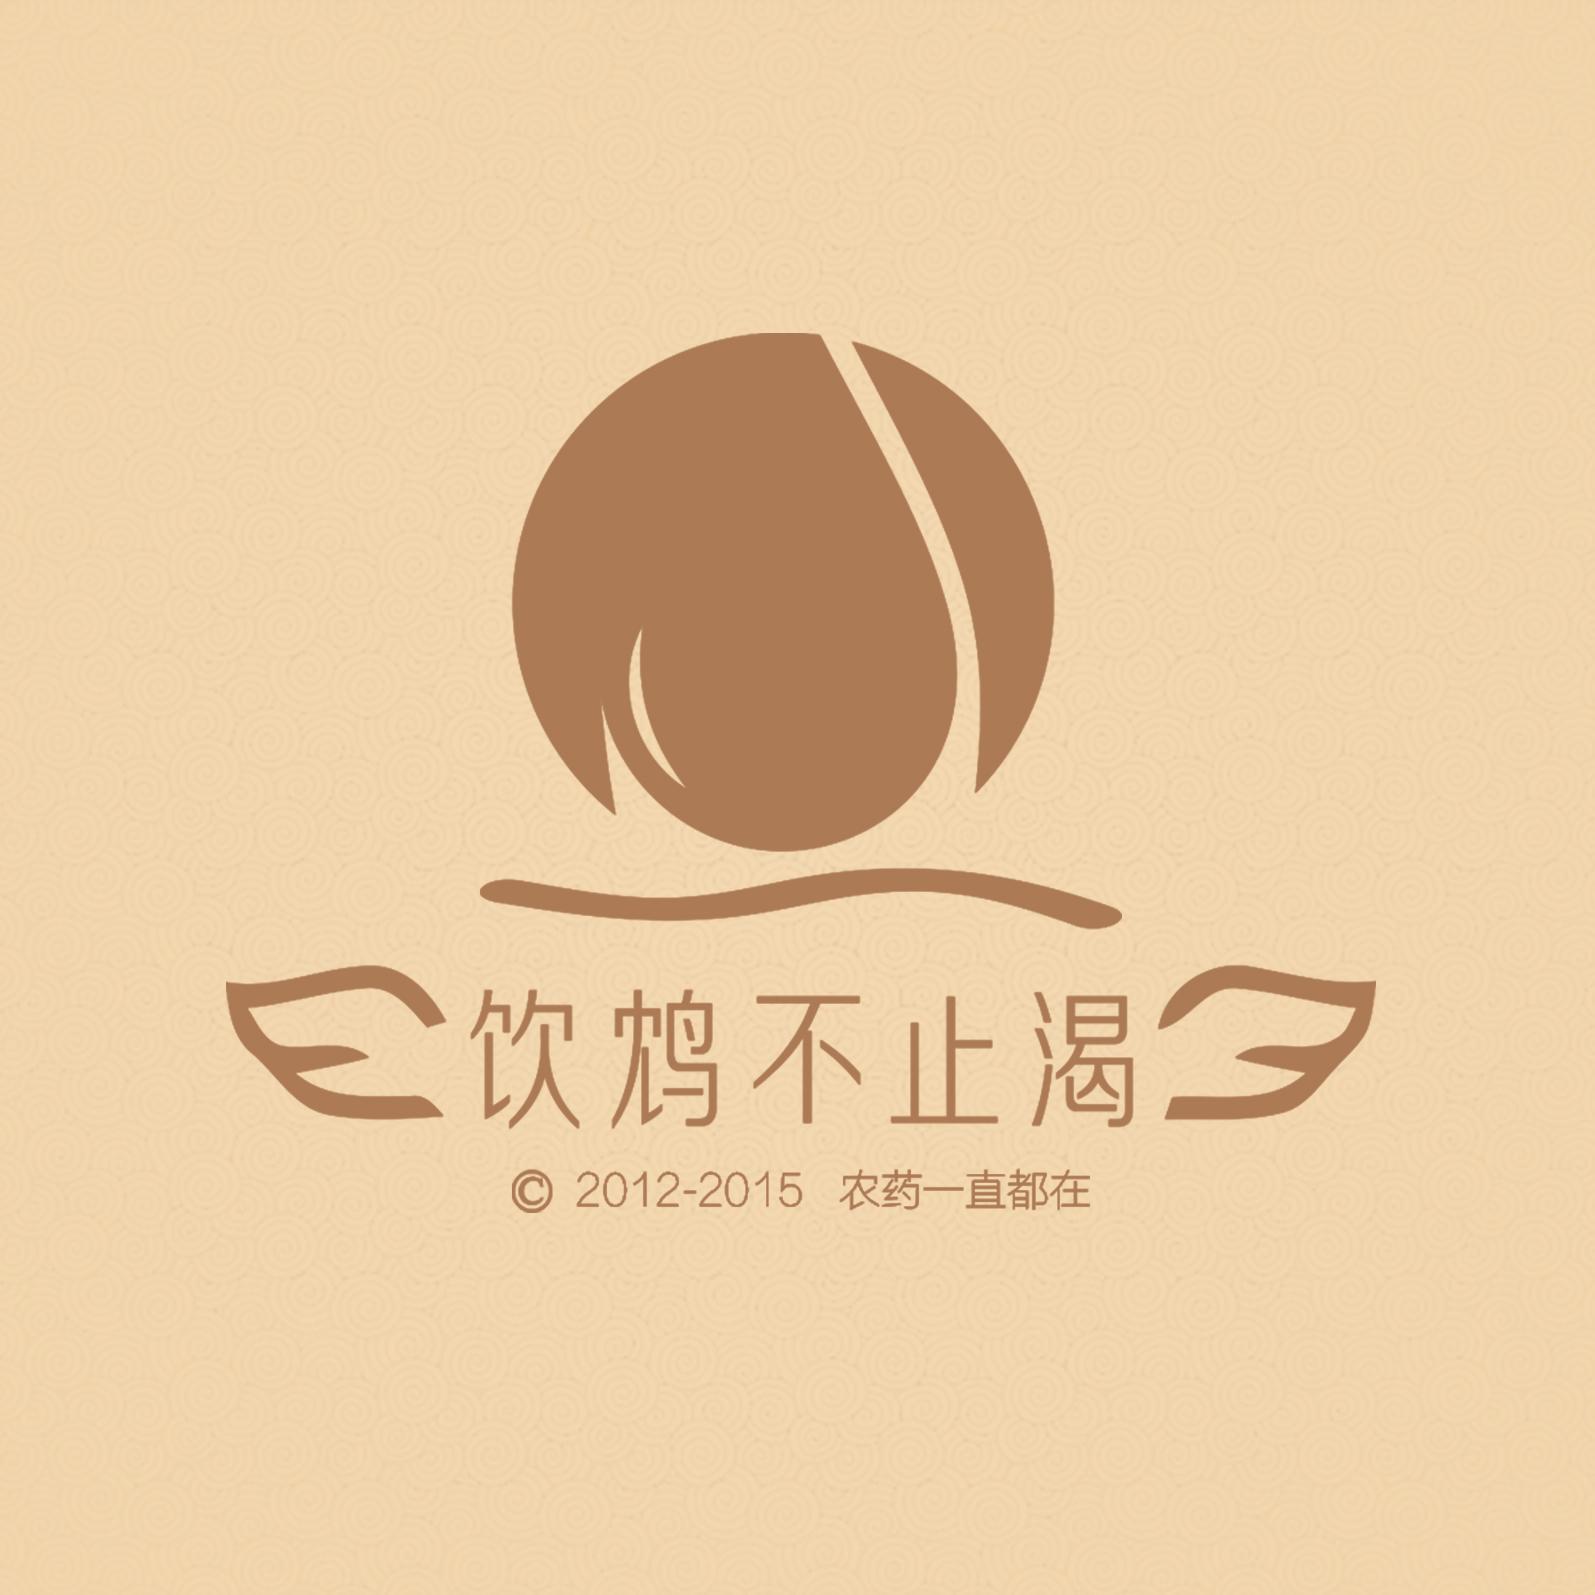 <![CDATA[饮鸩不止渴]]>